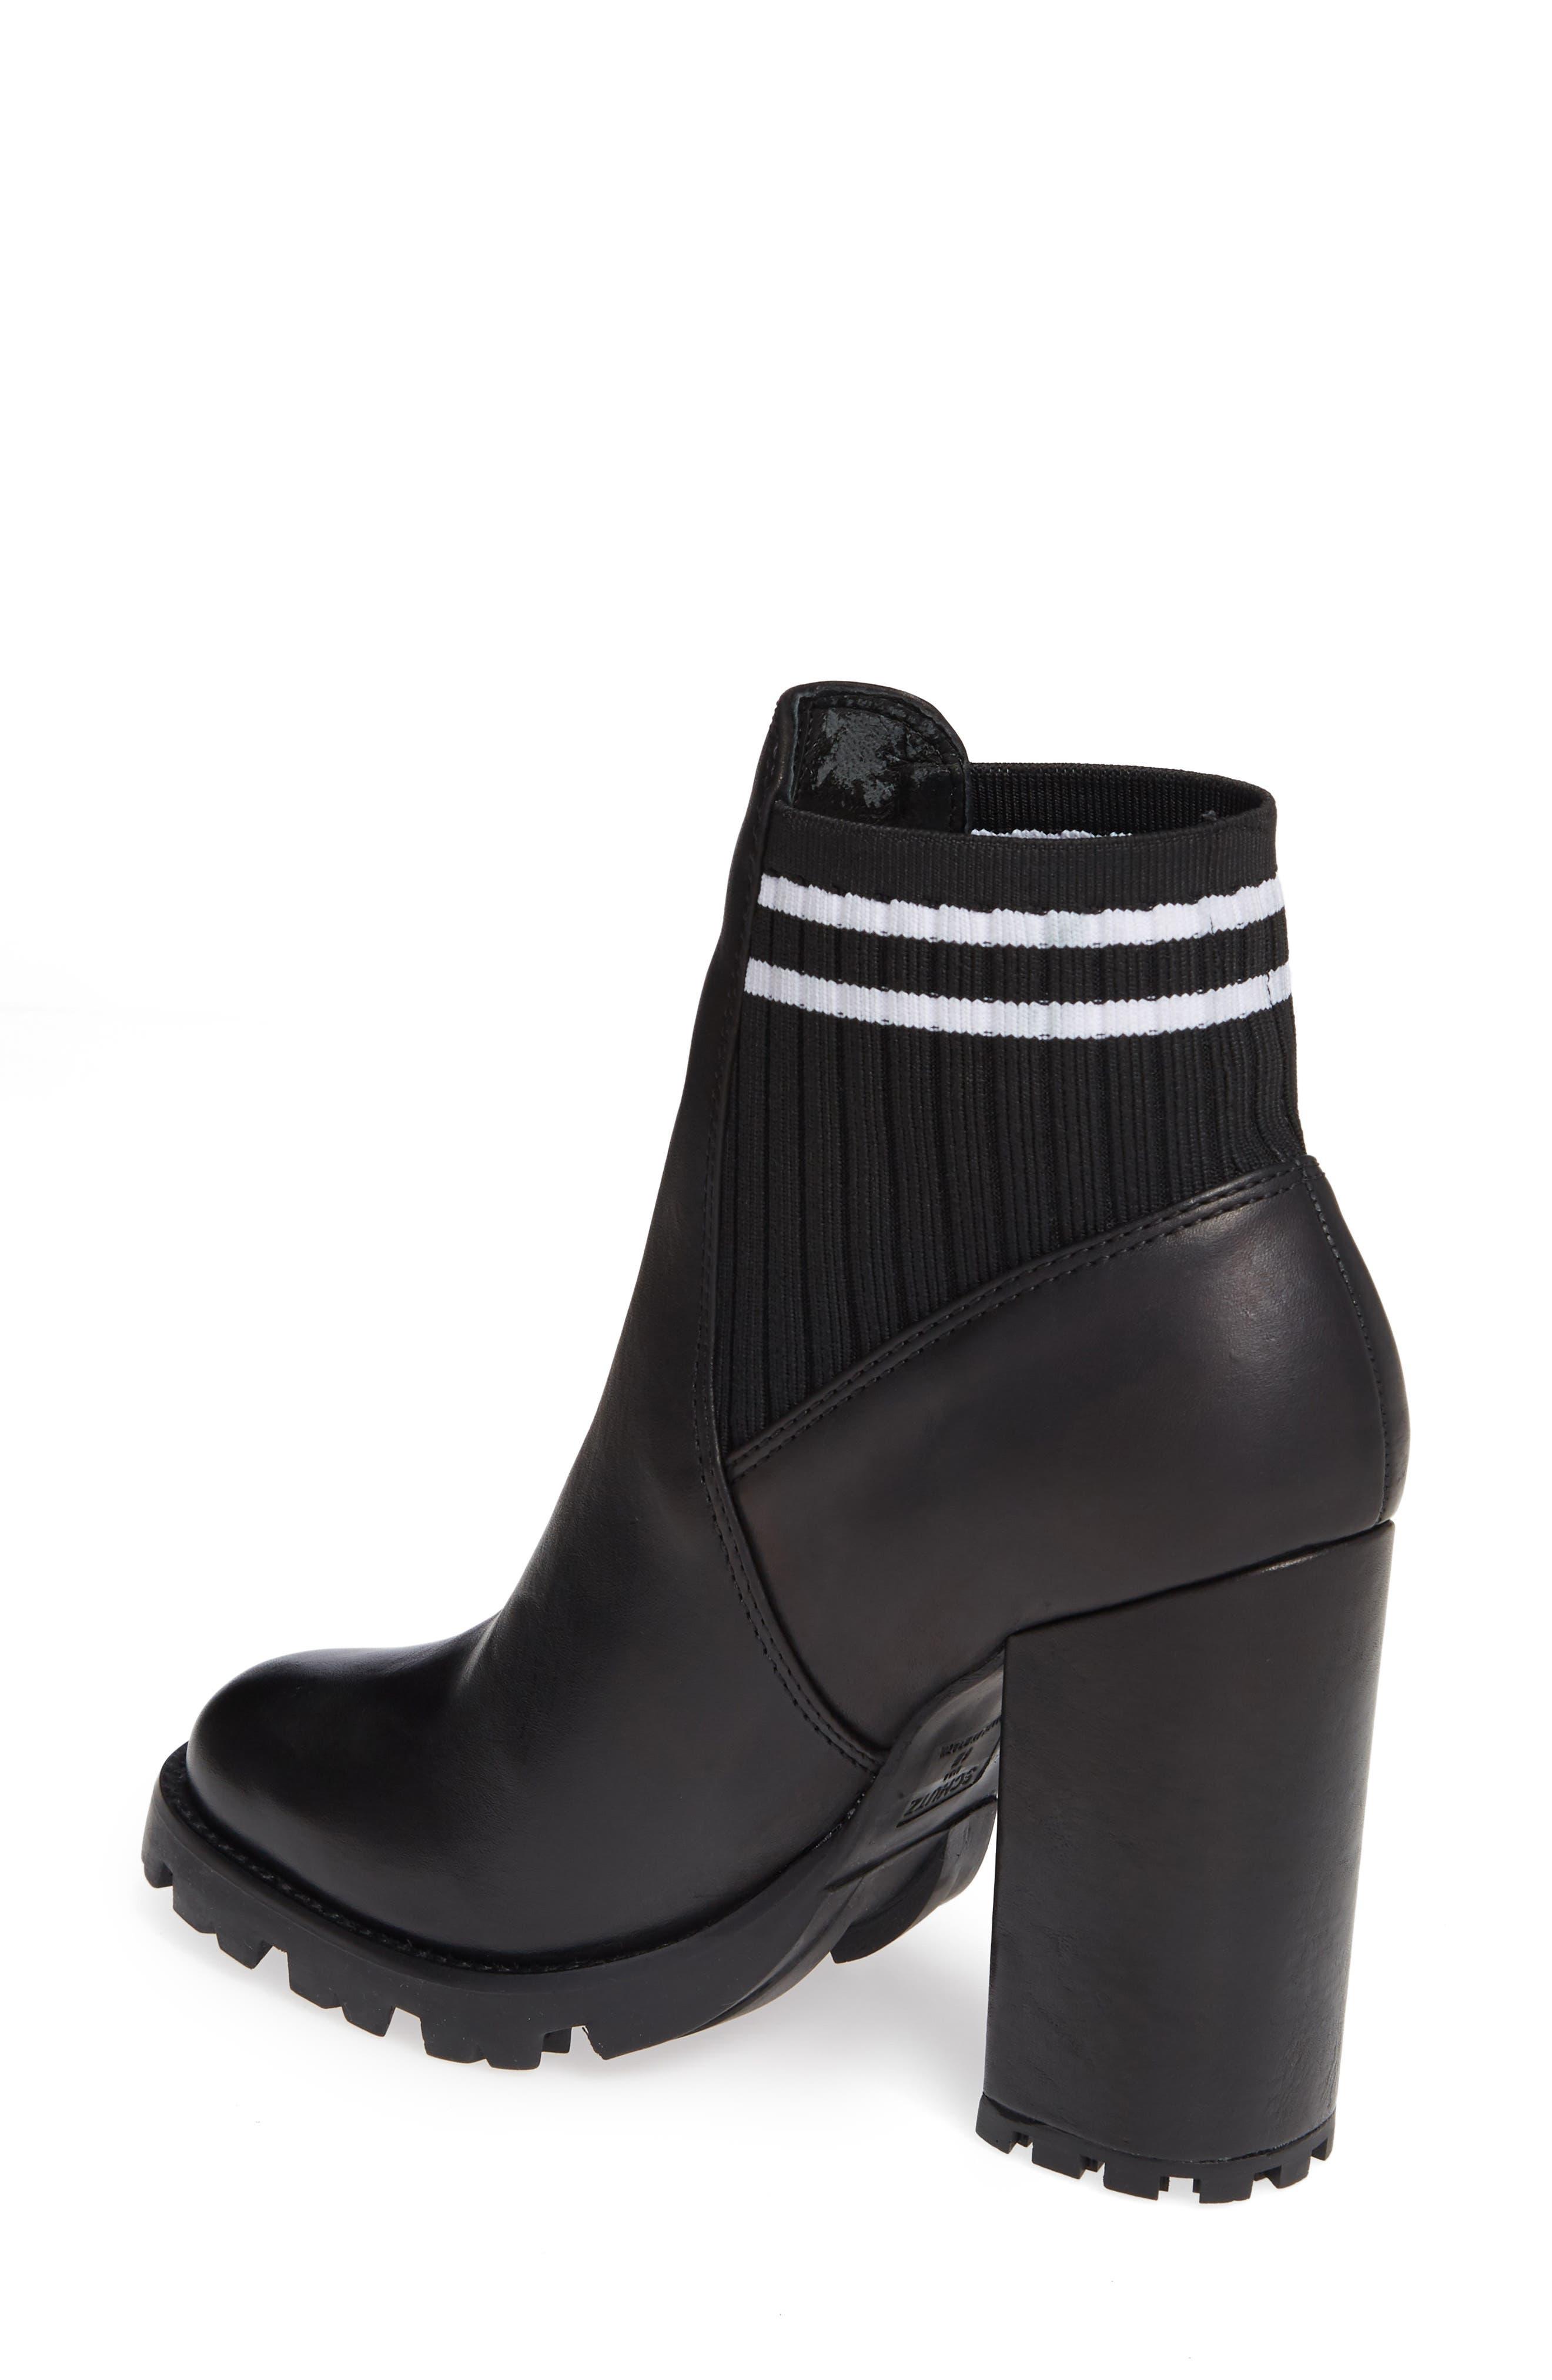 Ilenne Platform Sock Bootie,                             Alternate thumbnail 2, color,                             BLACK/ WHITE